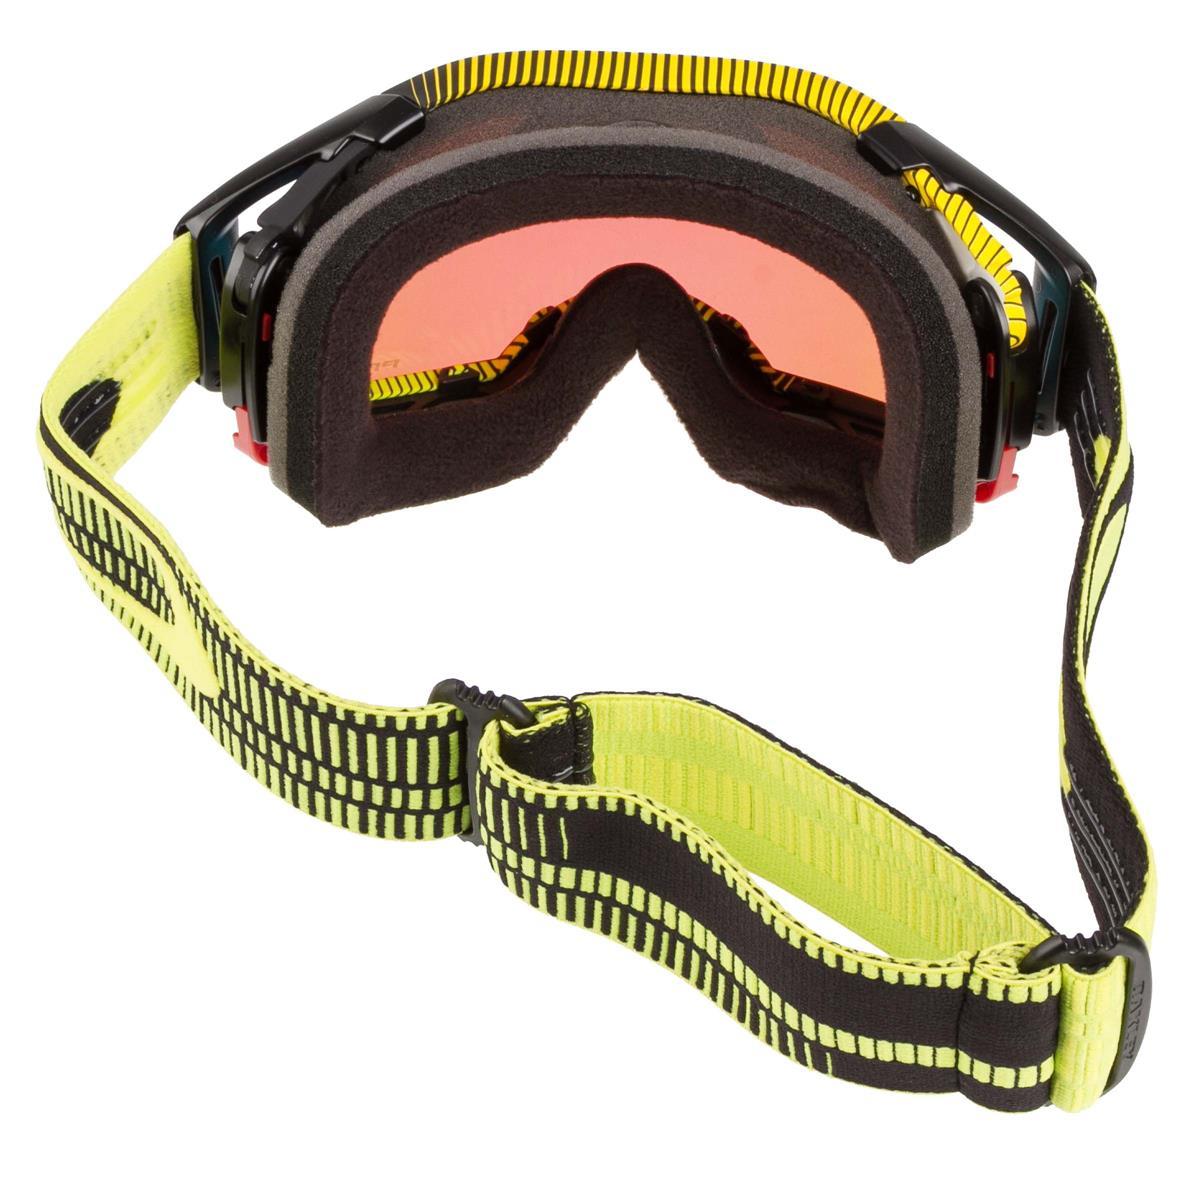 44eb64843e2 1. 2. 3. 4. PrevNext. Oakley Shop. Oakley MX Goggle Airbrake MX Frequency  Green Yellow - Prizm ...